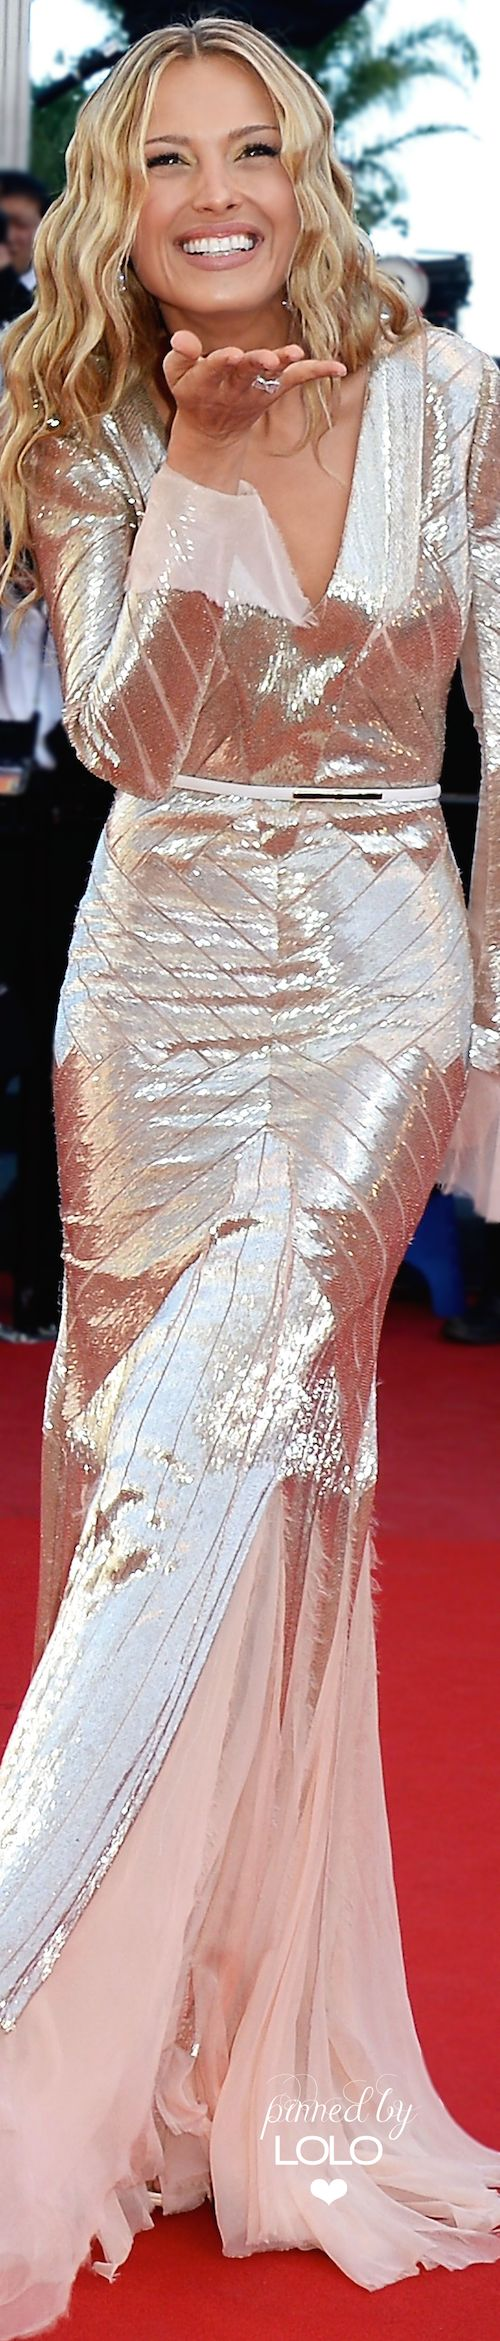 Petra Nemcova Cannes | LOLO❤